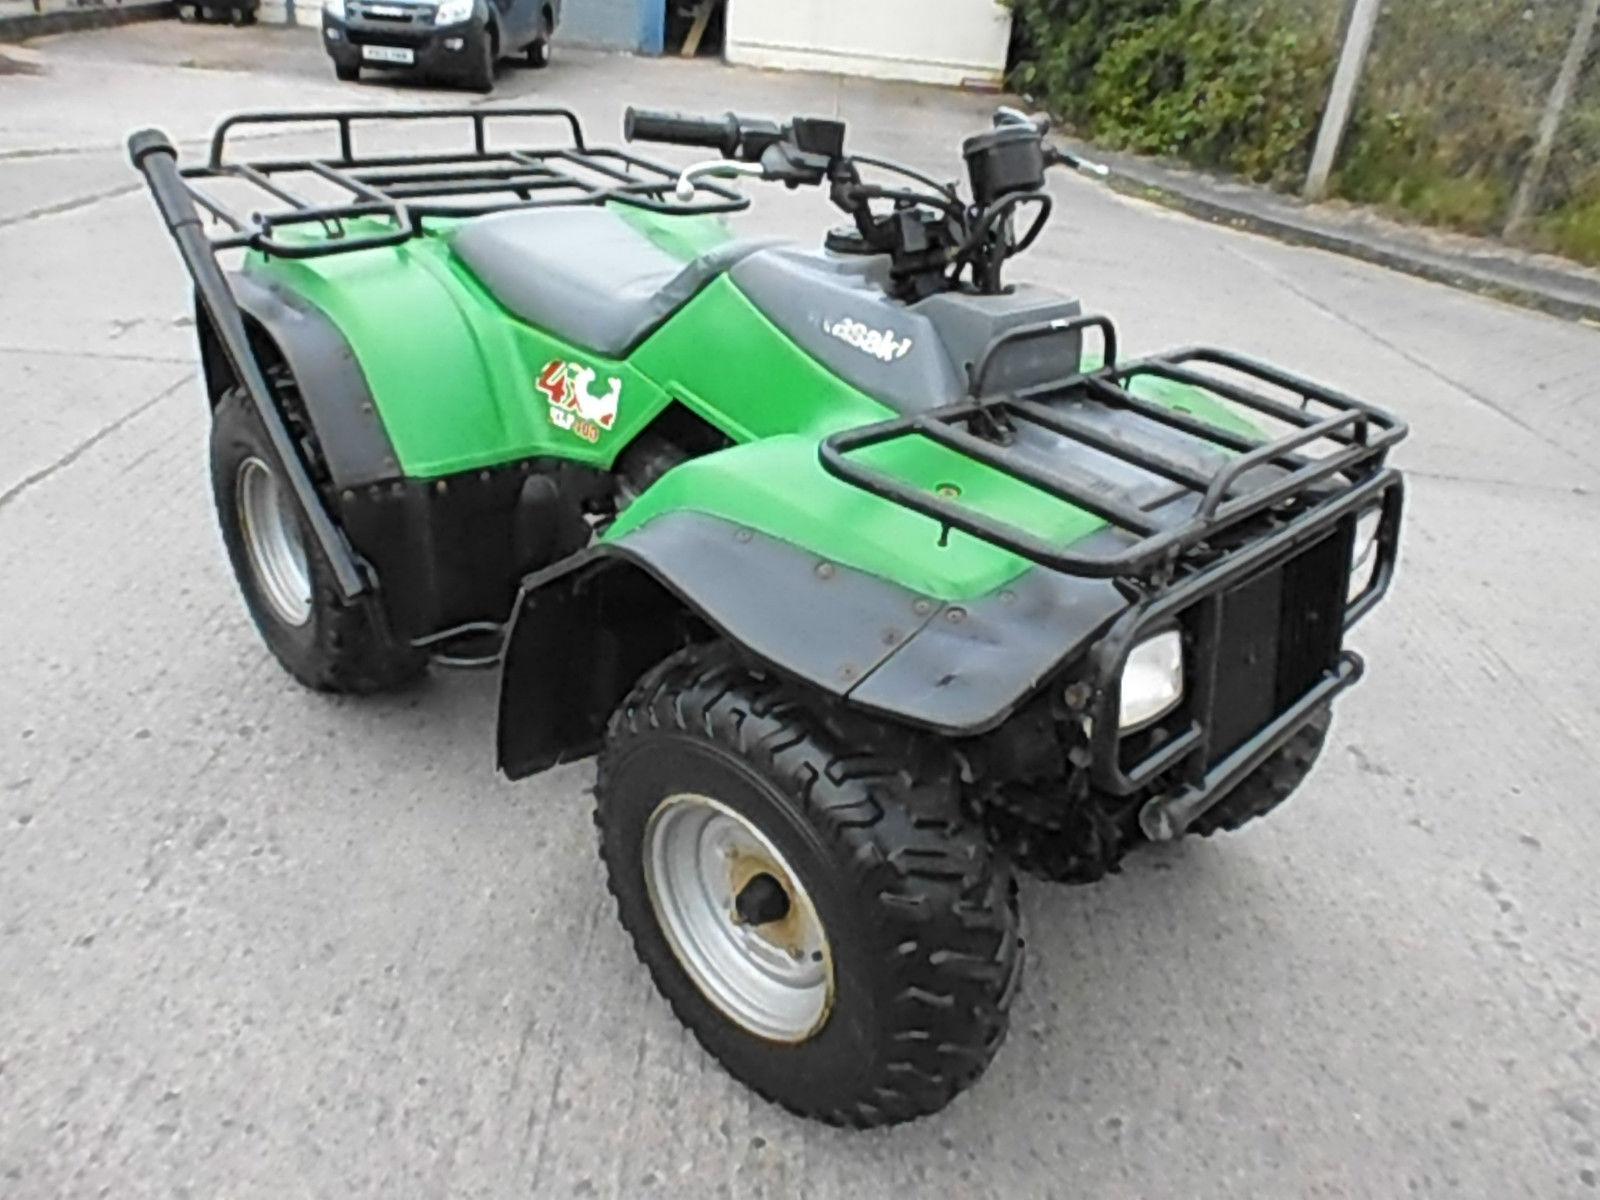 kawasaki klf 400 4x4 farm quad bike atv spares or repair. Black Bedroom Furniture Sets. Home Design Ideas